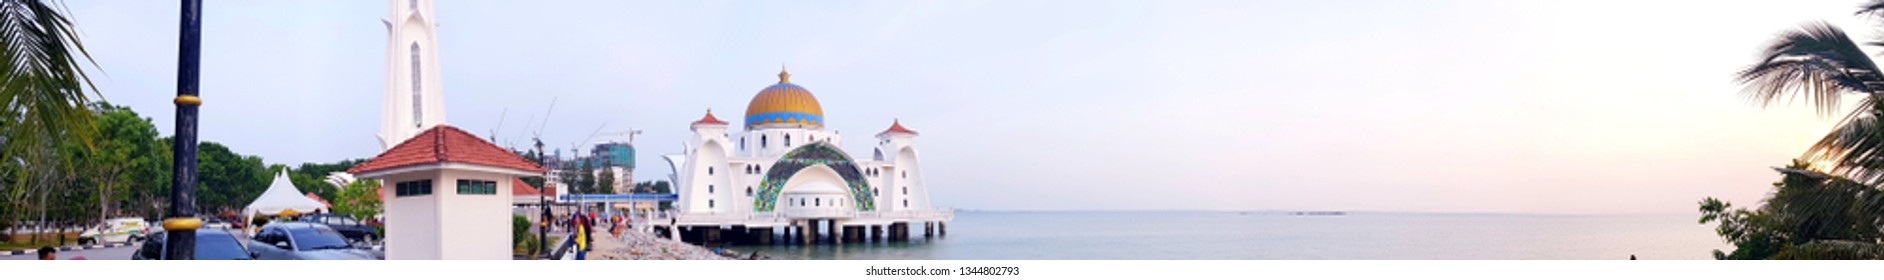 The Melaka Straits Mosque (Masjid Selat Melaka), Melaka, Malaysia - Jan 24th, 2019 - is a mosque located on the man-made Malacca Island in Malacca City, Malacca, Malaysia